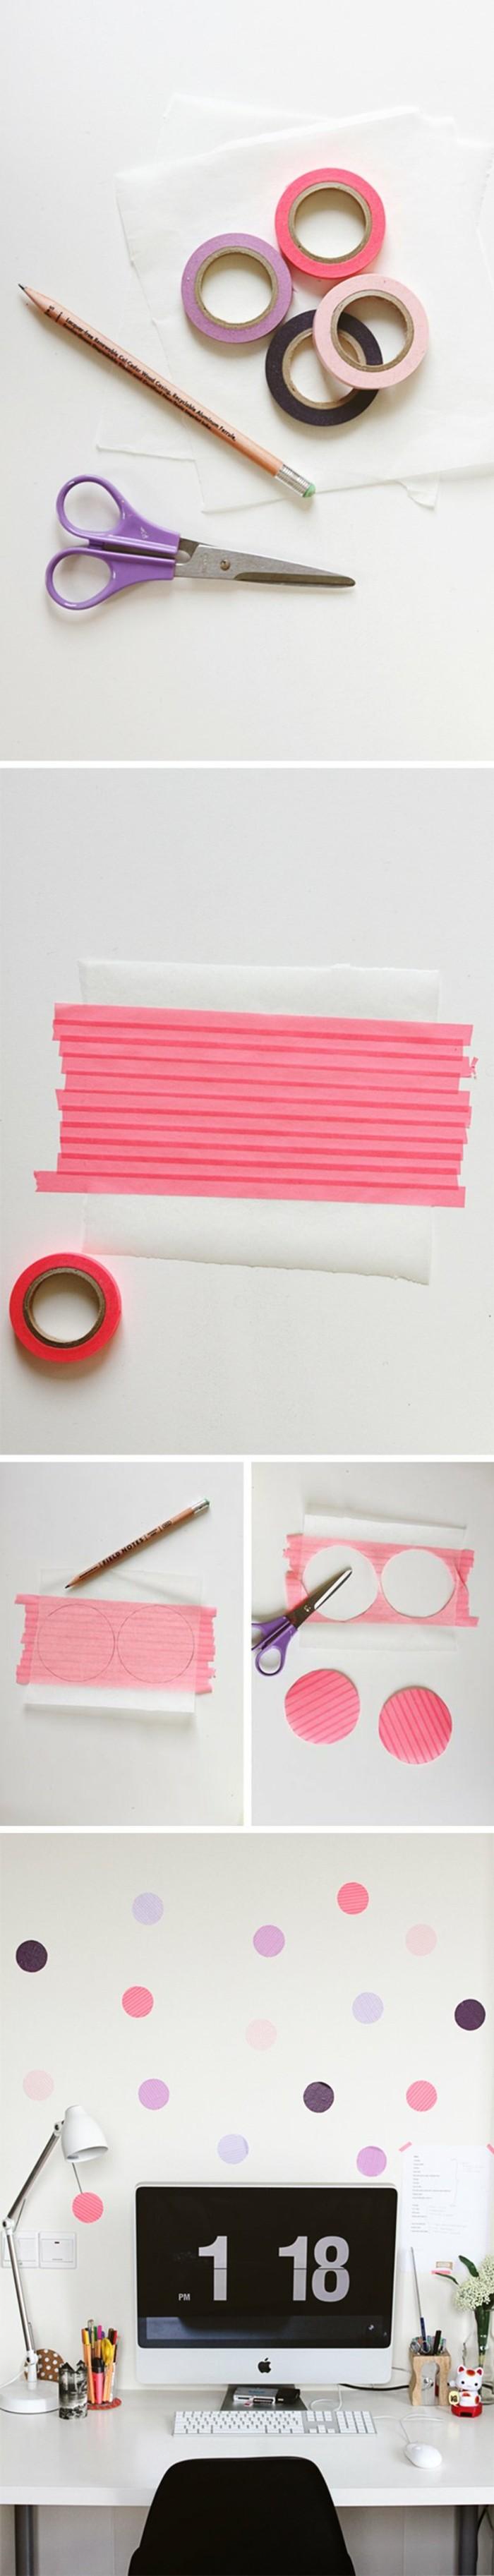 diy ideen mit washi tape wanddeko selber basteln   DIY - Do it ...